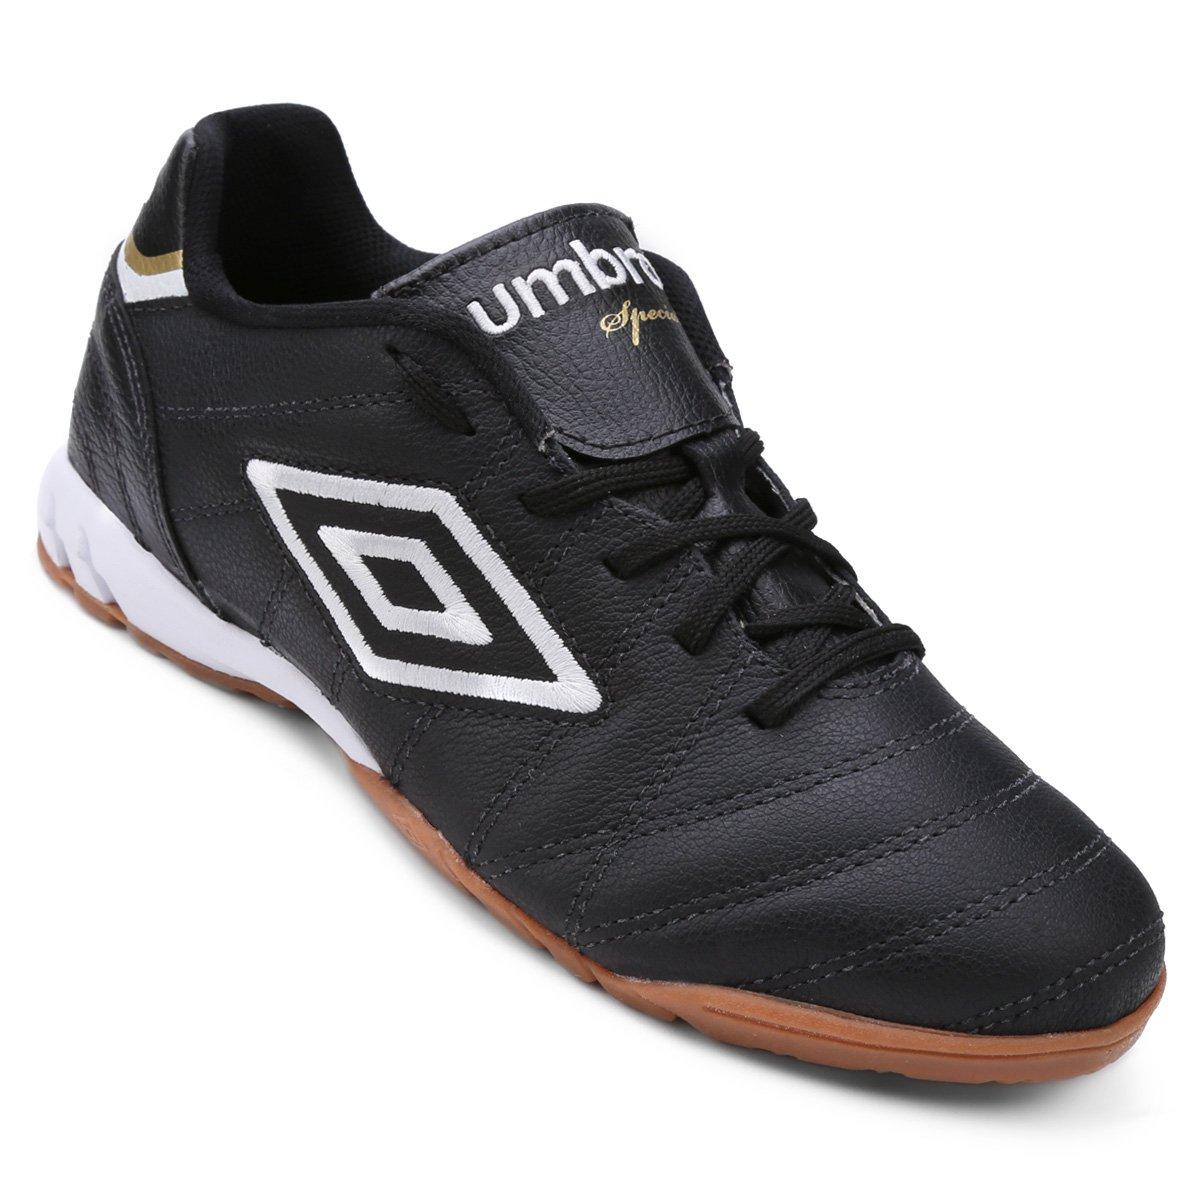 Chuteira Futsal Umbro Speciali Premier Masculina - Preto e Branco ... 2ae9e7f936a09